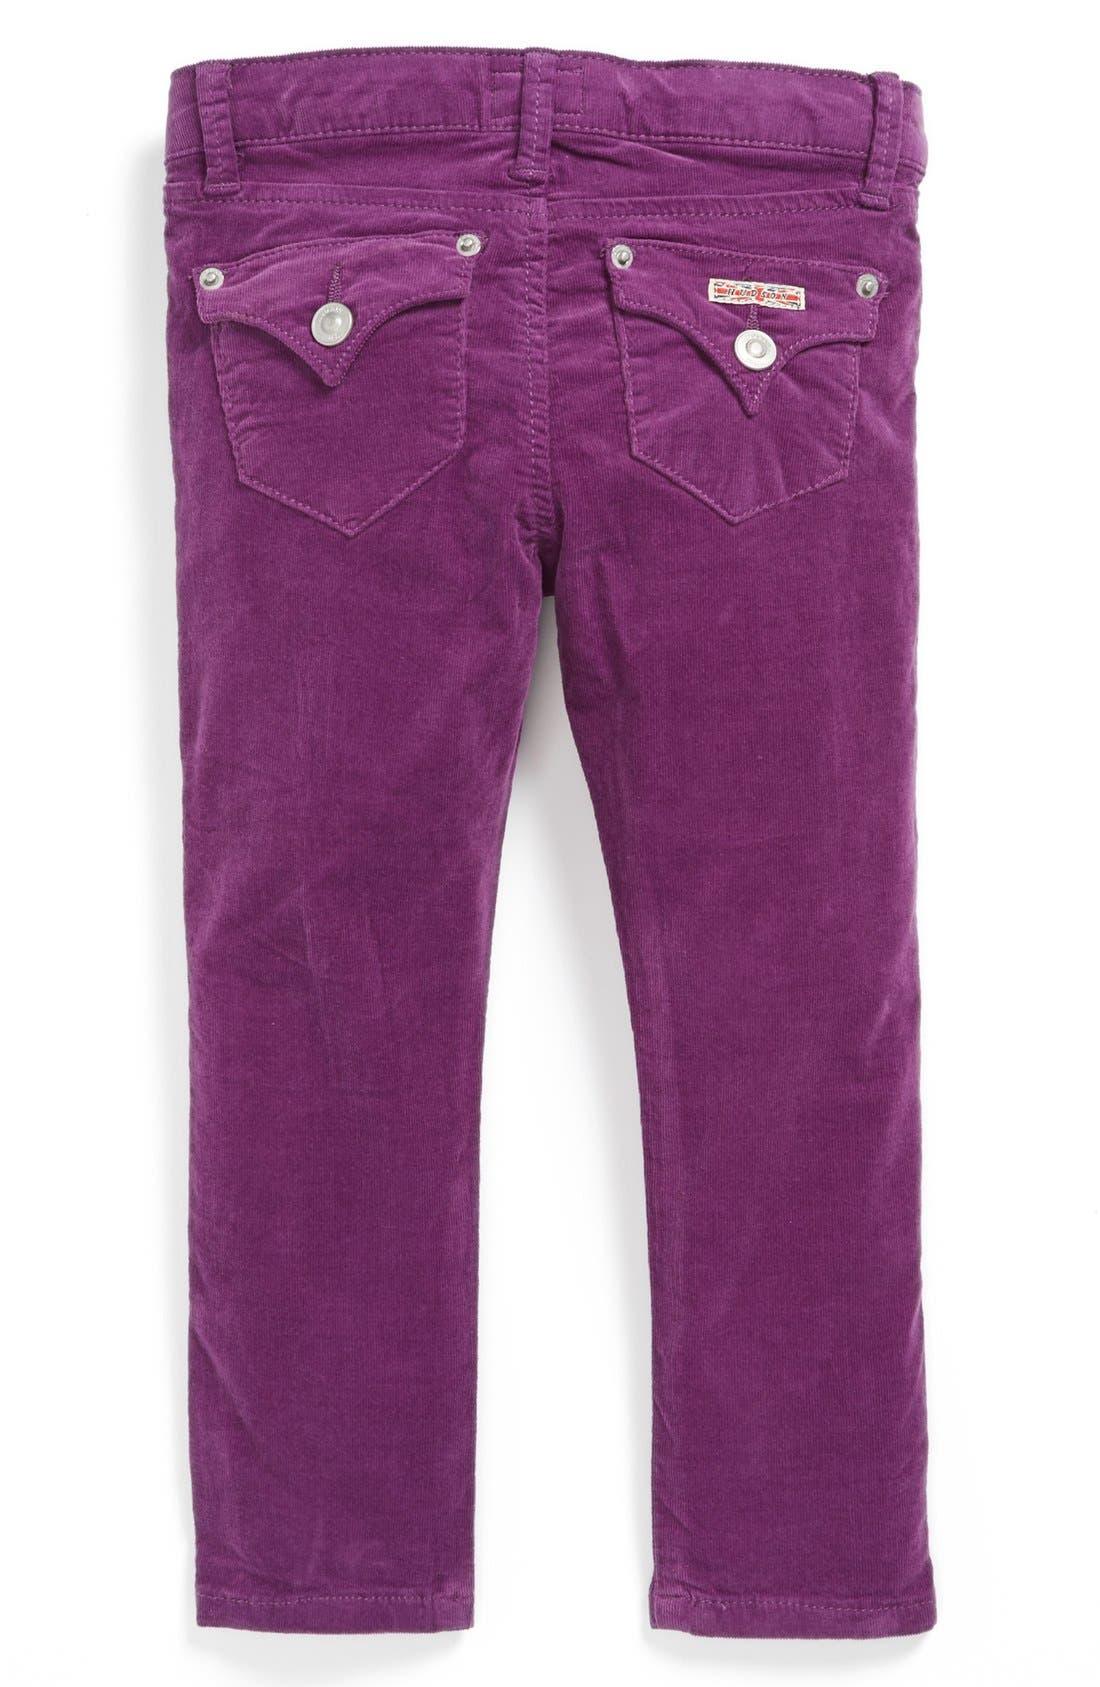 Alternate Image 1 Selected - Hudson Kids Corduroy Skinny Jeans (Toddler Girls)